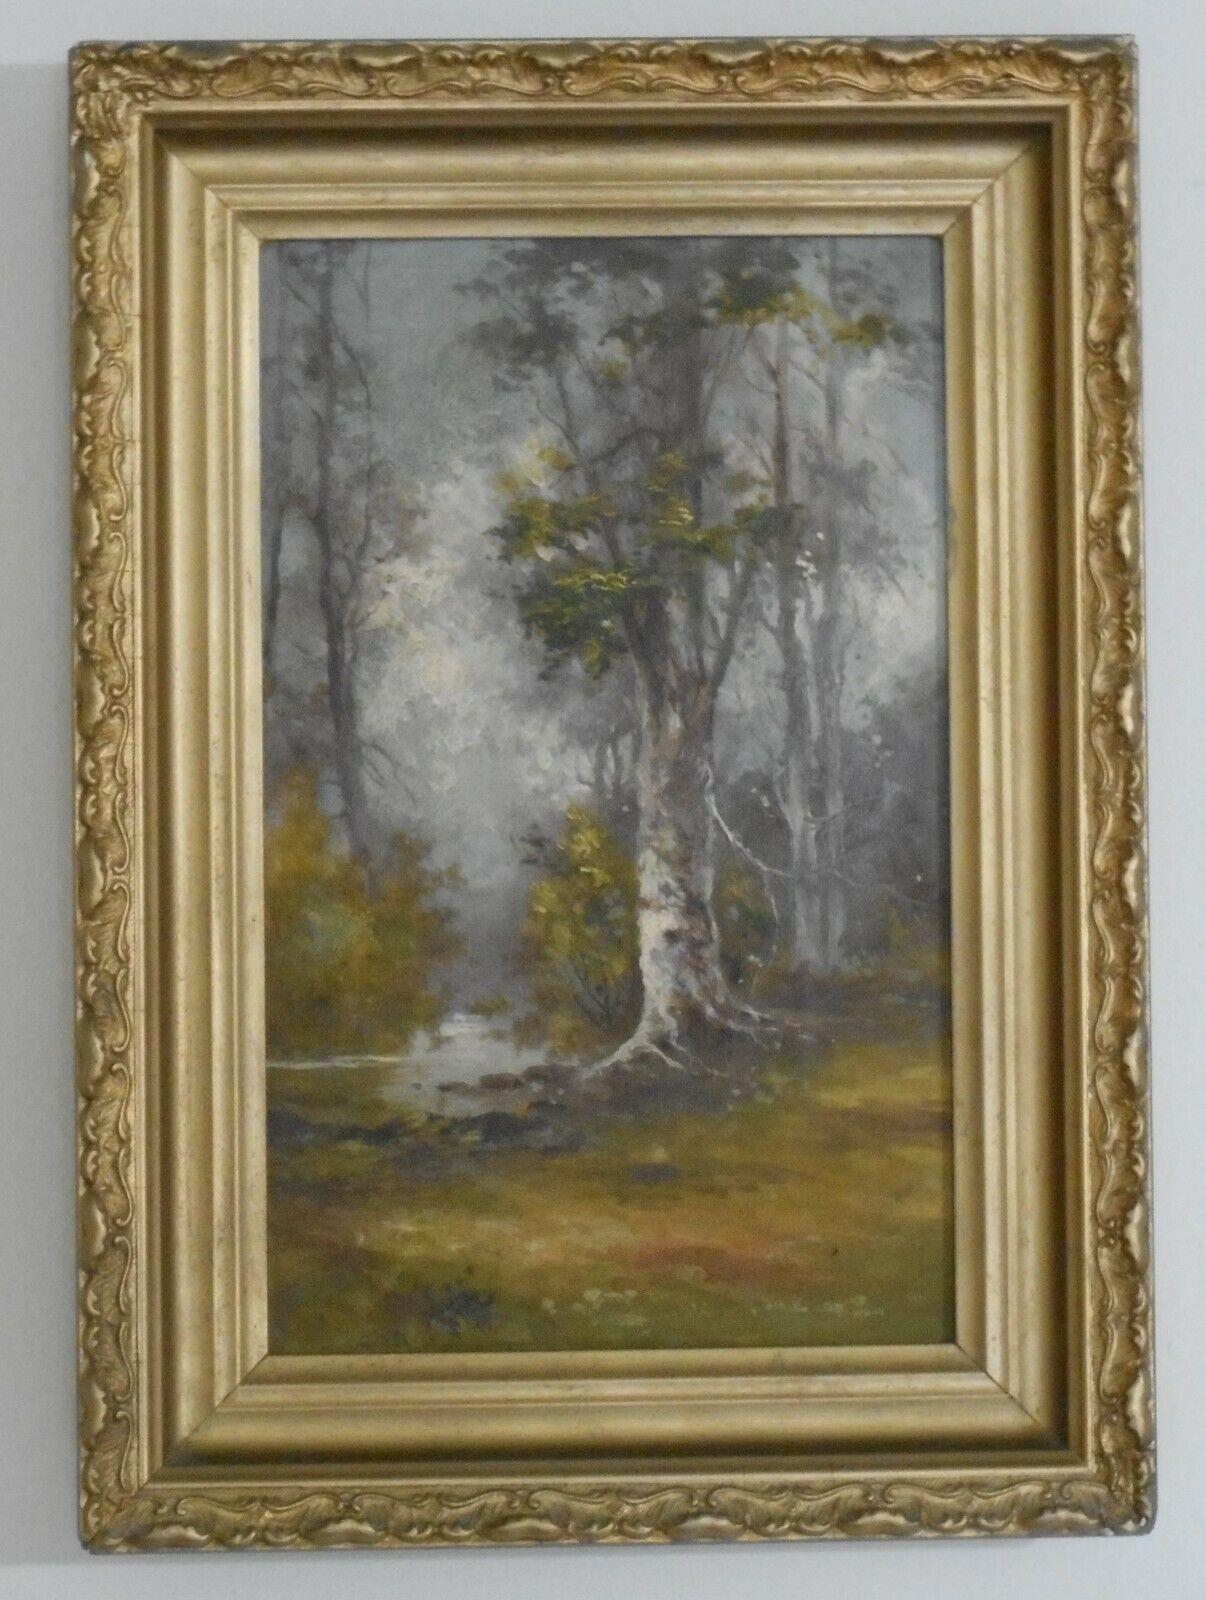 19th C American Impressionist Plein Air Oil On Board Birch Tree Forest Landscape - $95.00